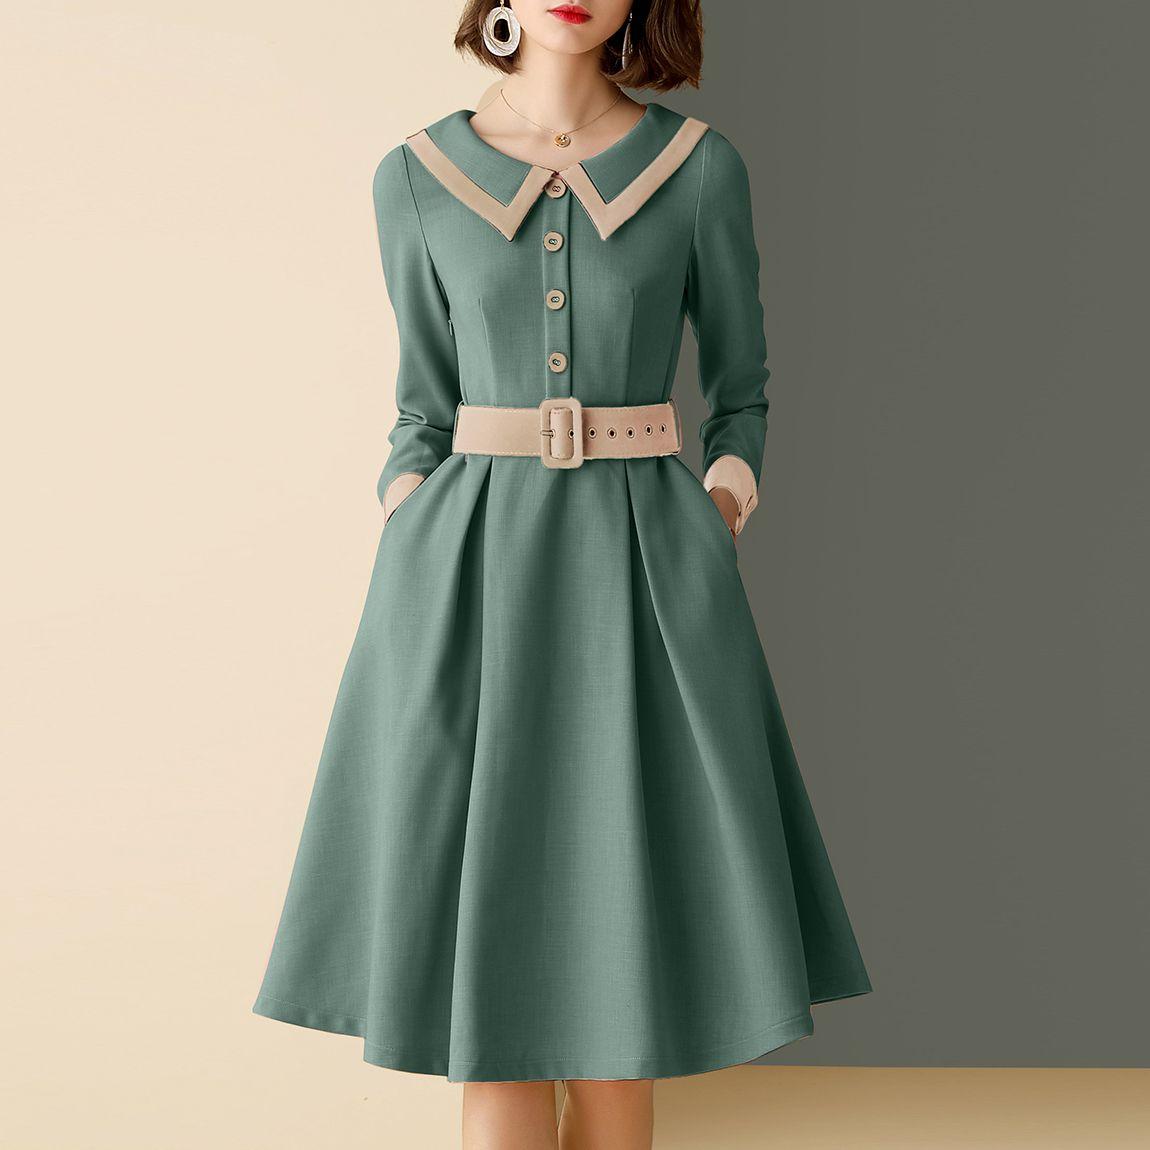 Classic Vintage Ladies Long Sleeve Dress Clothinsstyle Long Sleeve Dress Online Women Long Sleeve Dress Long Sleeve Dress [ 1150 x 1150 Pixel ]